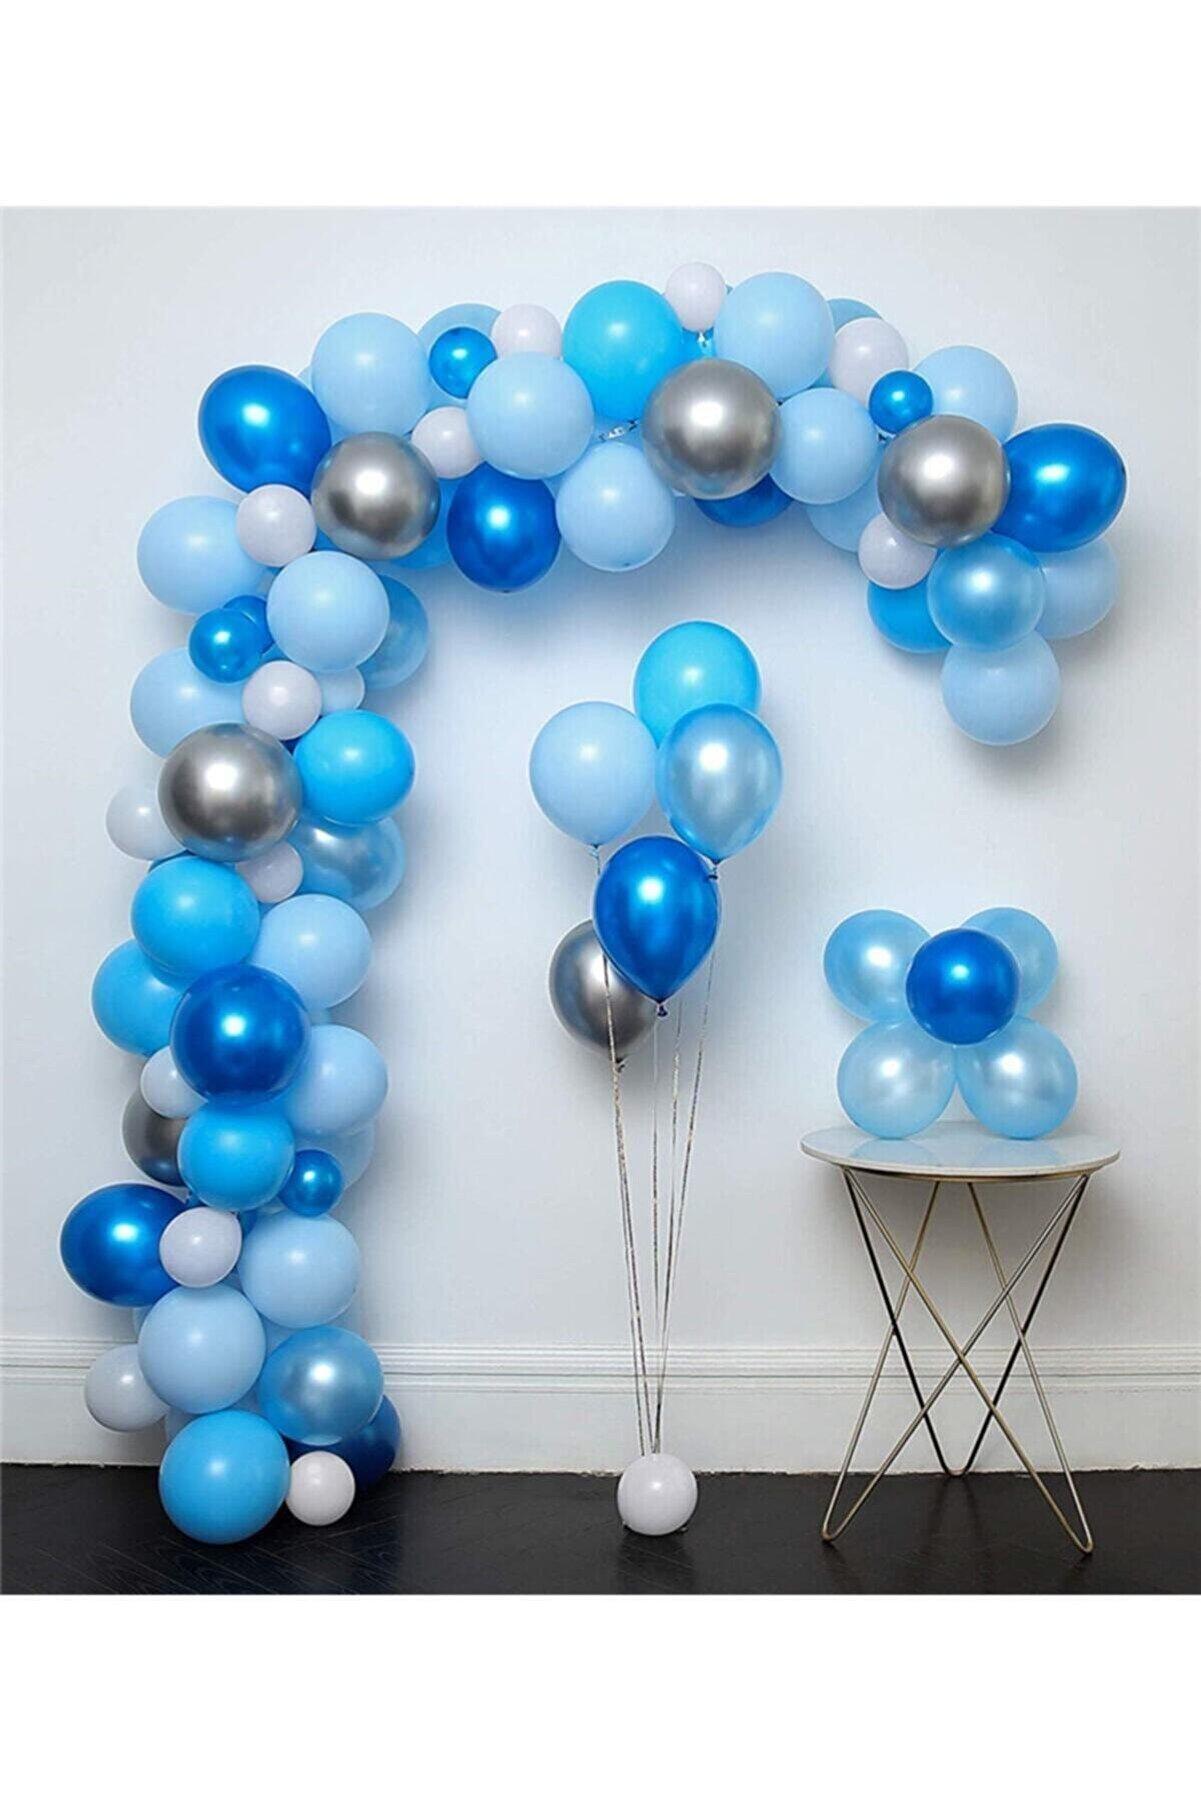 MERİ PARTİ 100 Adet Lacivert Mavi Beyaz Metalik Balon Gri Krom Balon Zincir